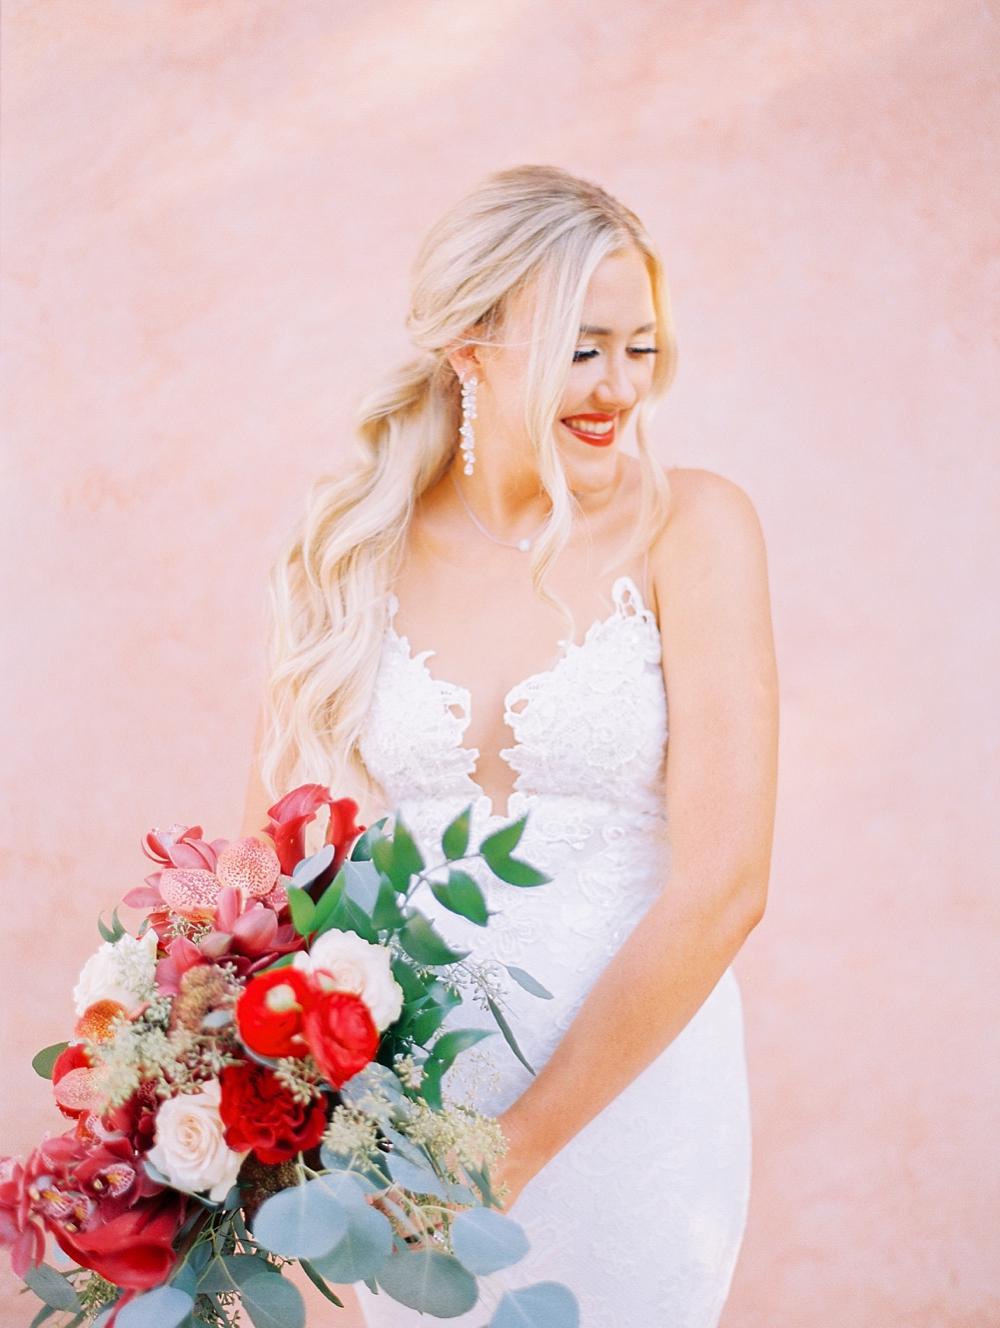 kristin-la-voie-photography-AUSTIN-WEDDING-PHOTOGRAPHER-BEST-IN-TEXAS-7